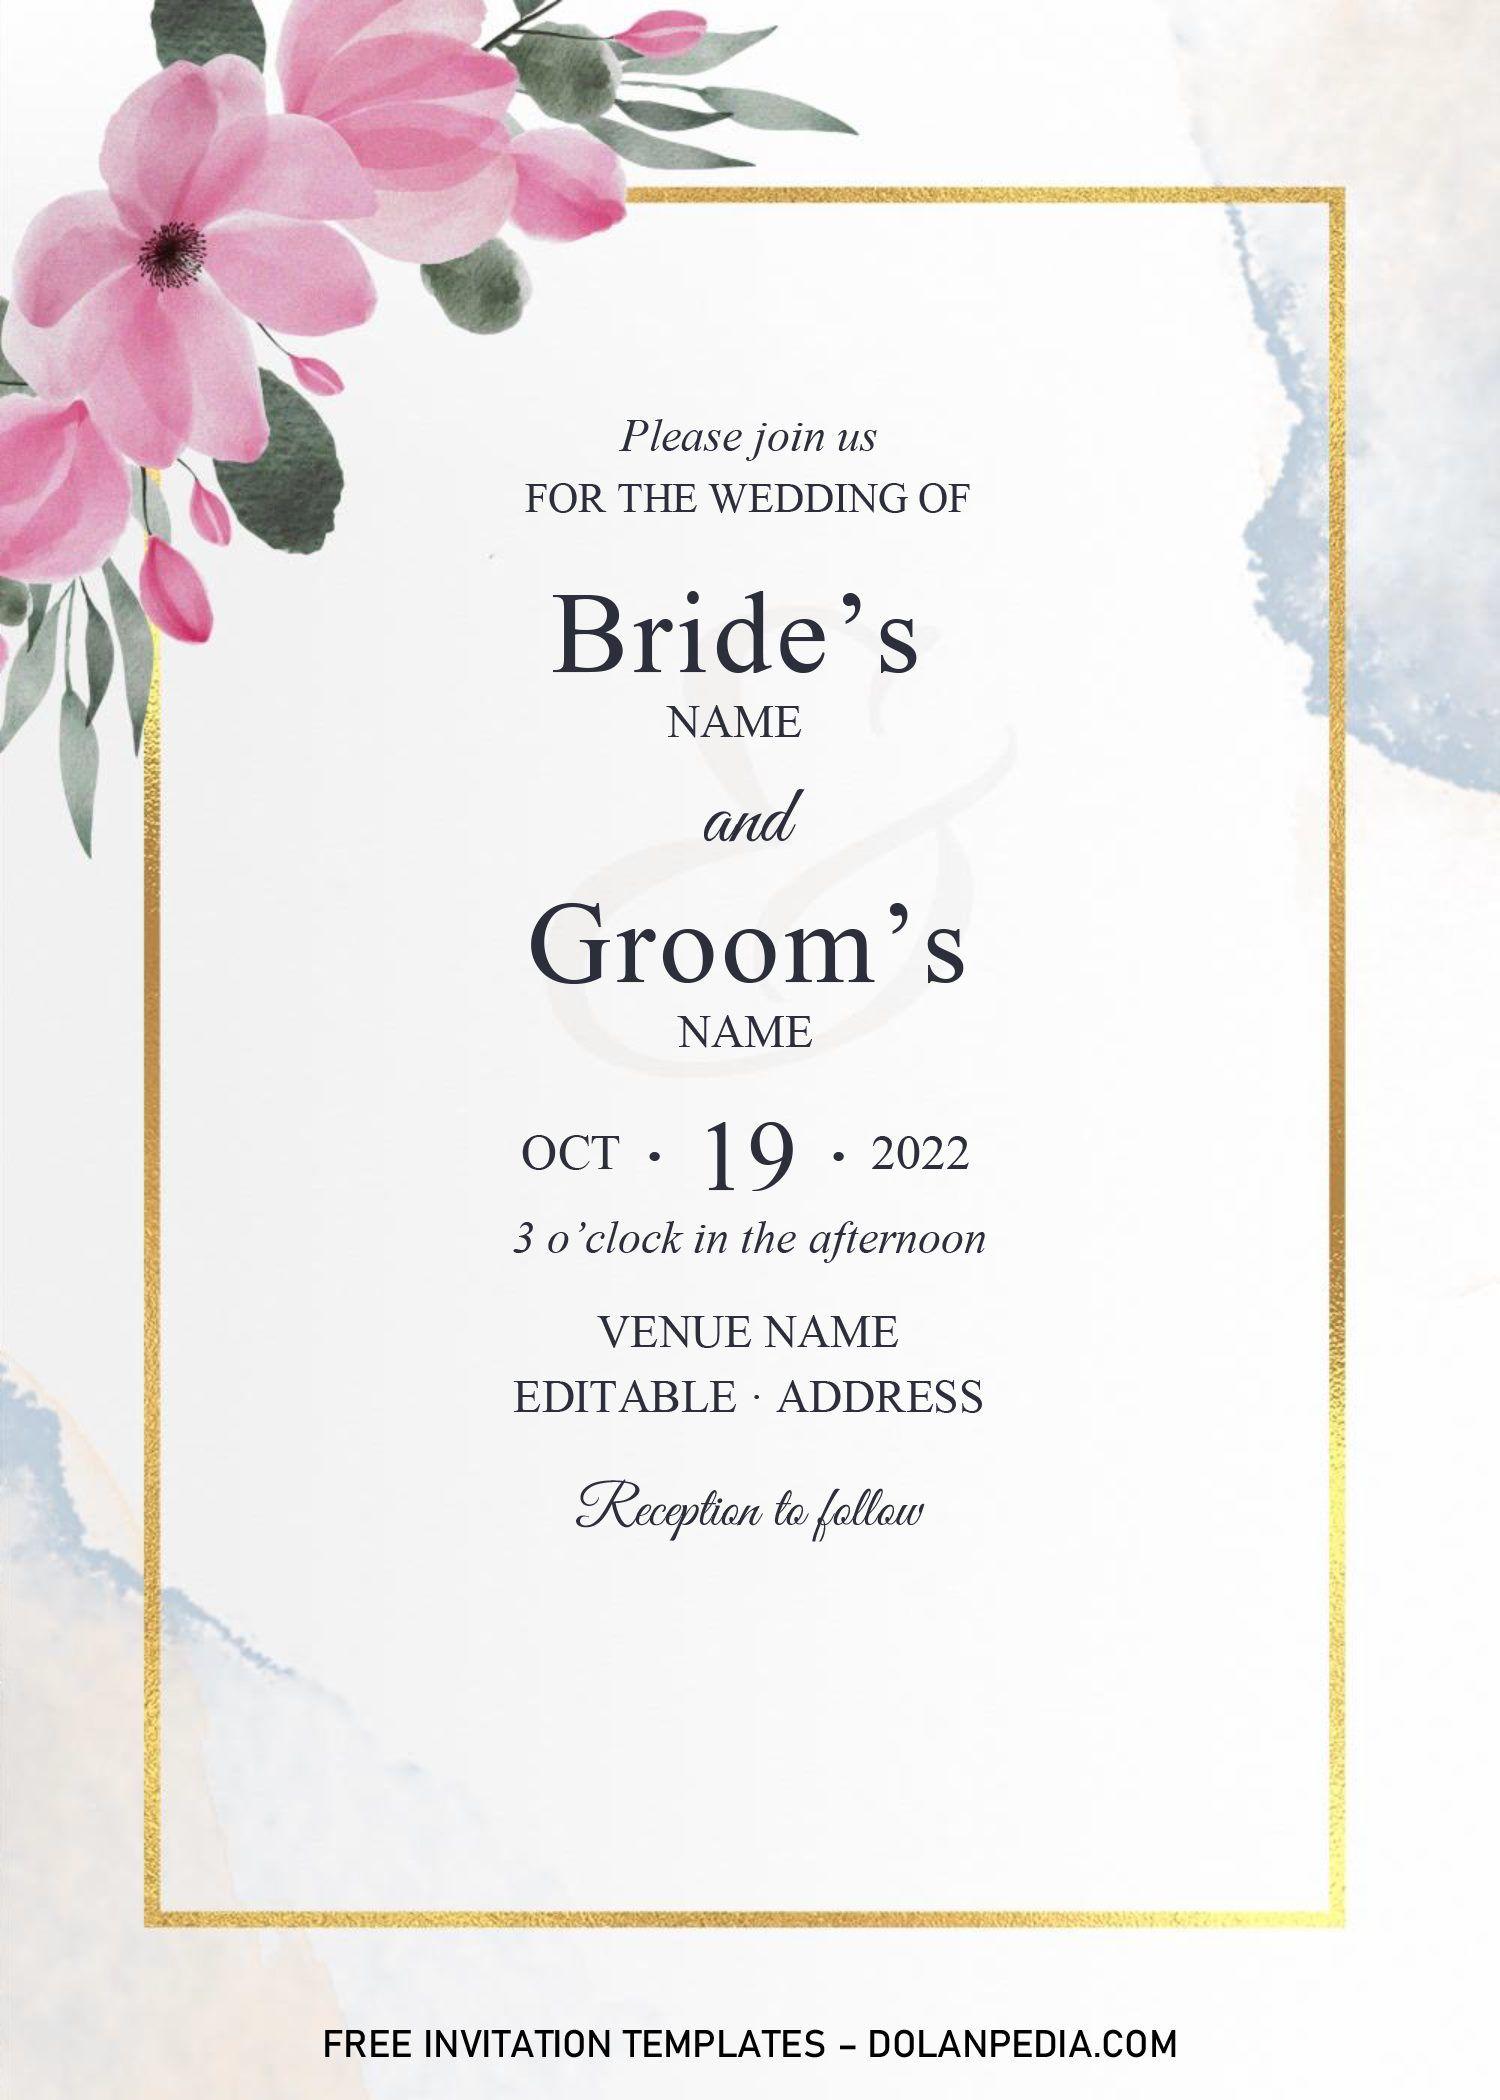 Golden Frame Wedding Invitation Templates Editable With Microsoft Word Frame Wedding Invitation Wedding Invitation Templates Invitation Template